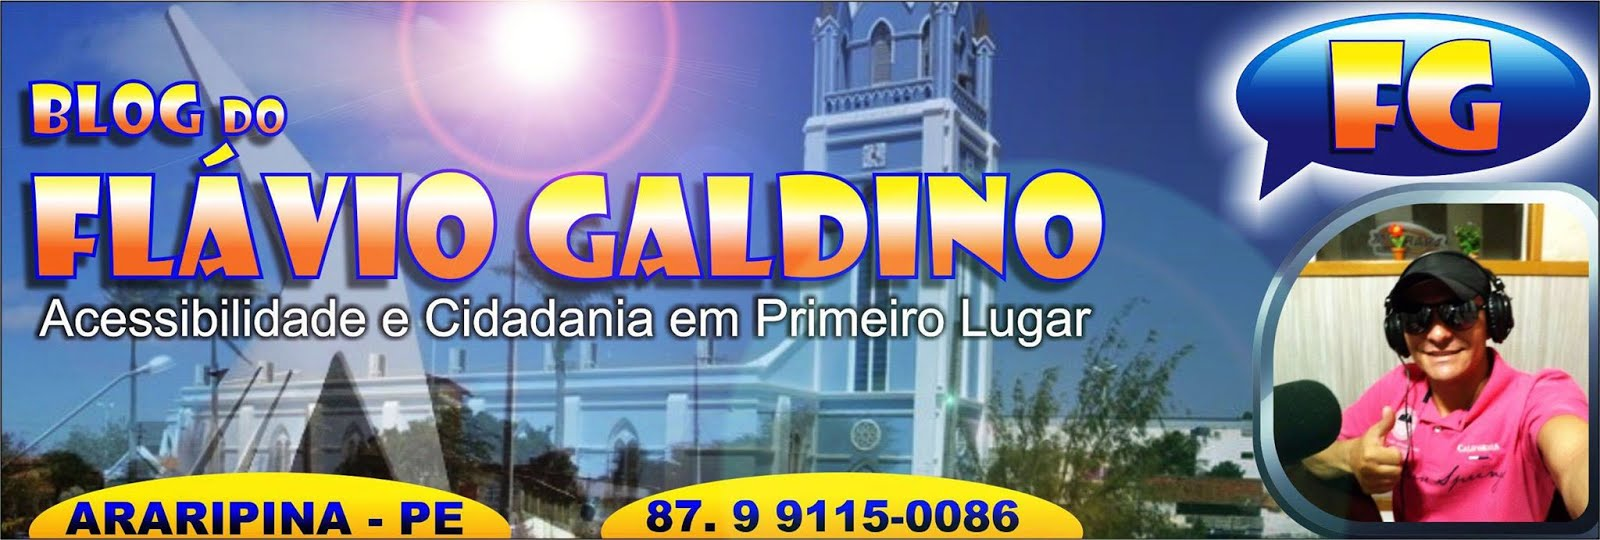 Blog Do Flávio Galdino De Araripina - PE